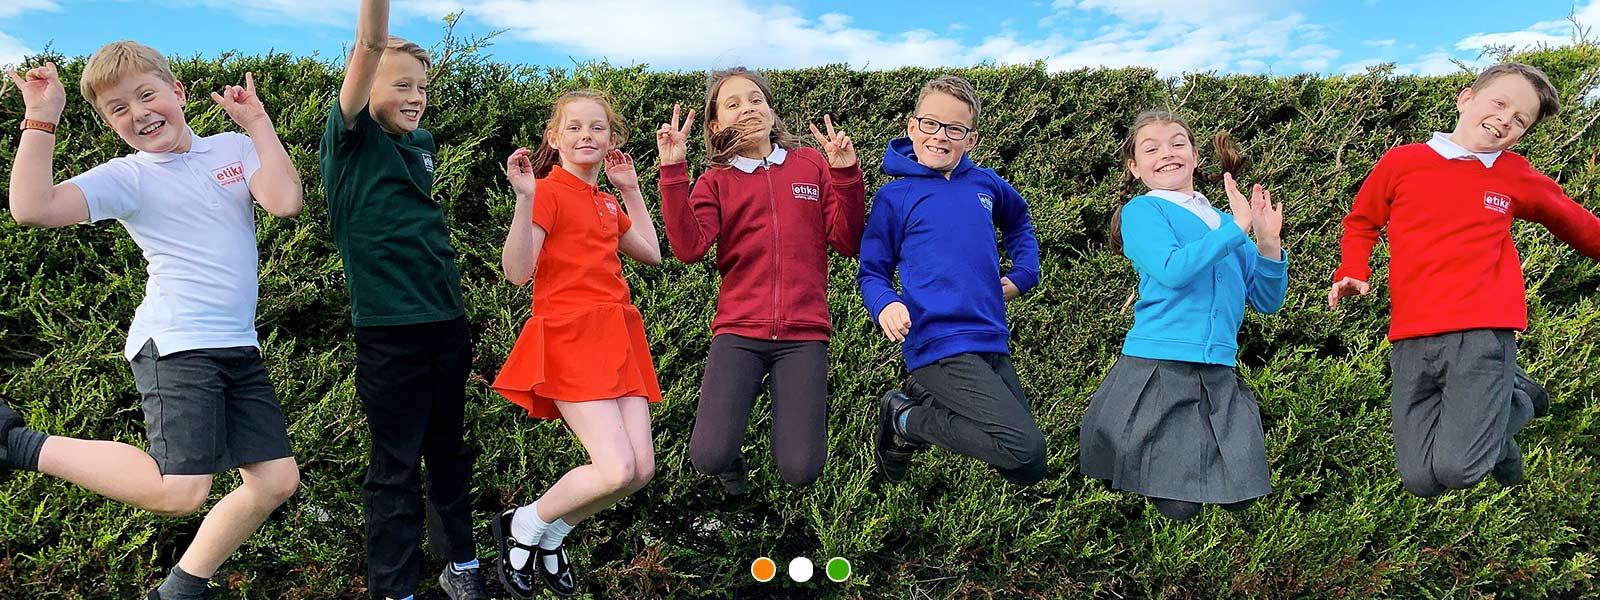 Green Lane School kids photo